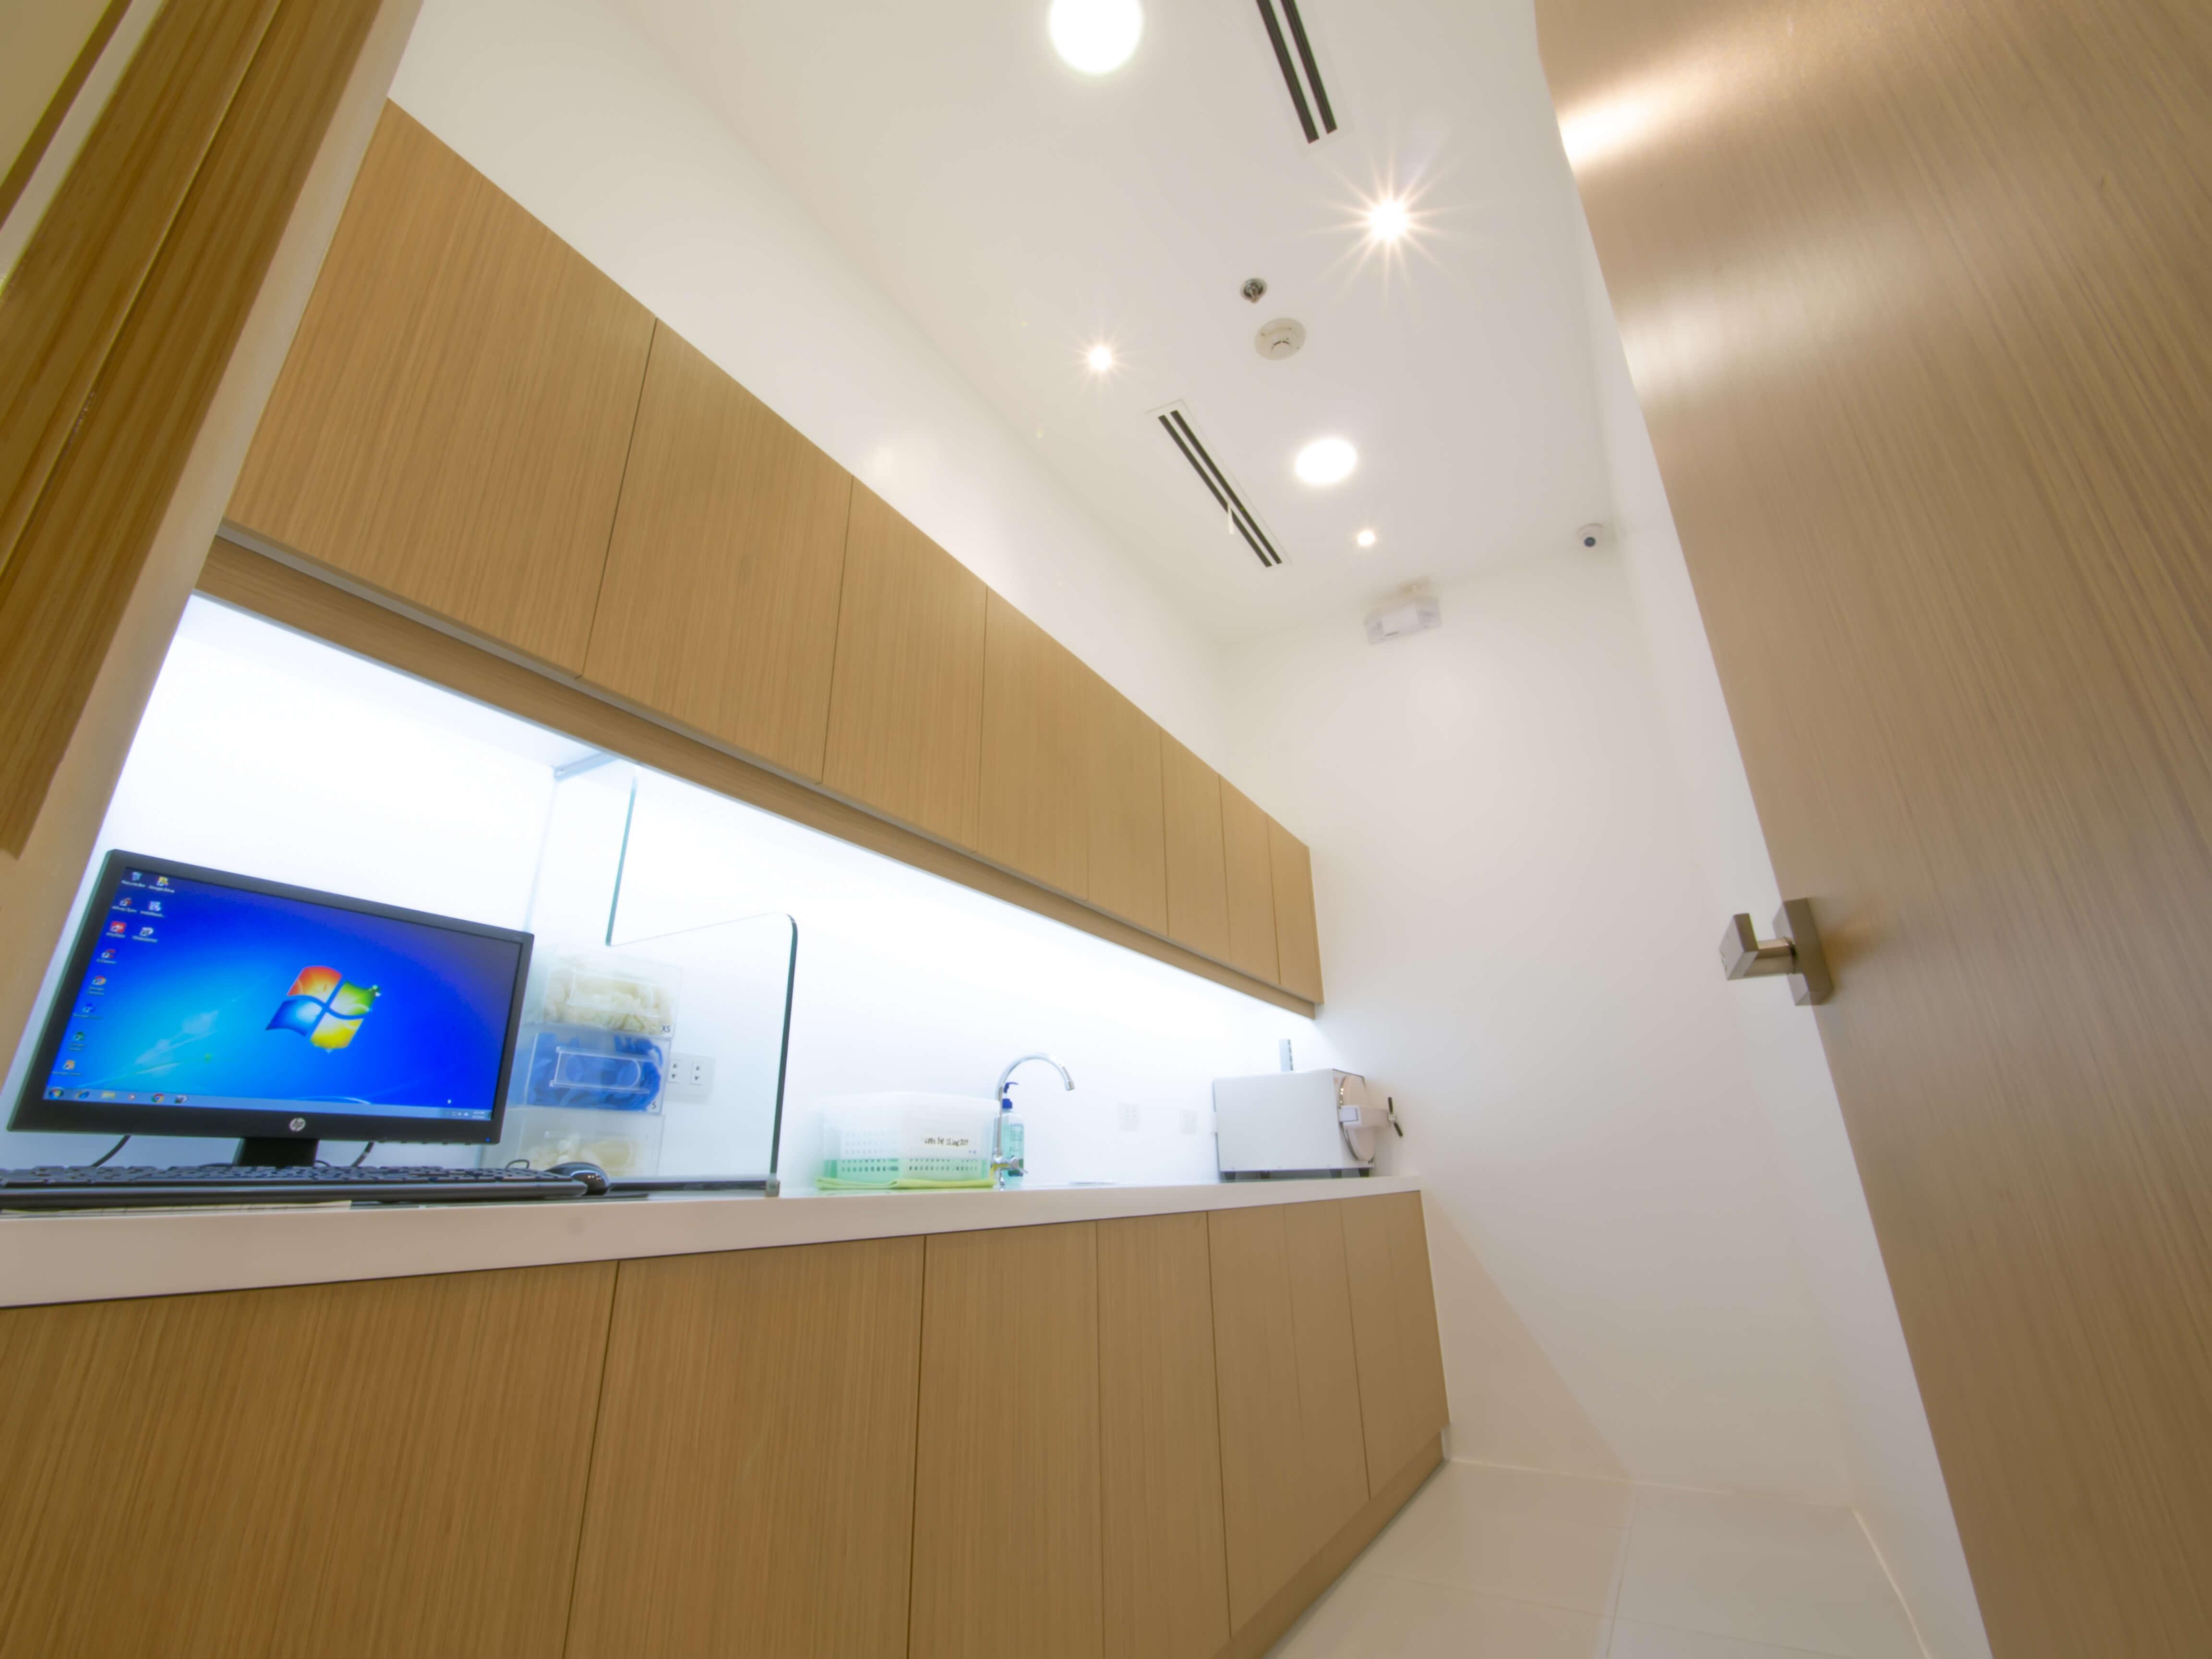 novodental                                                                      sterilization room